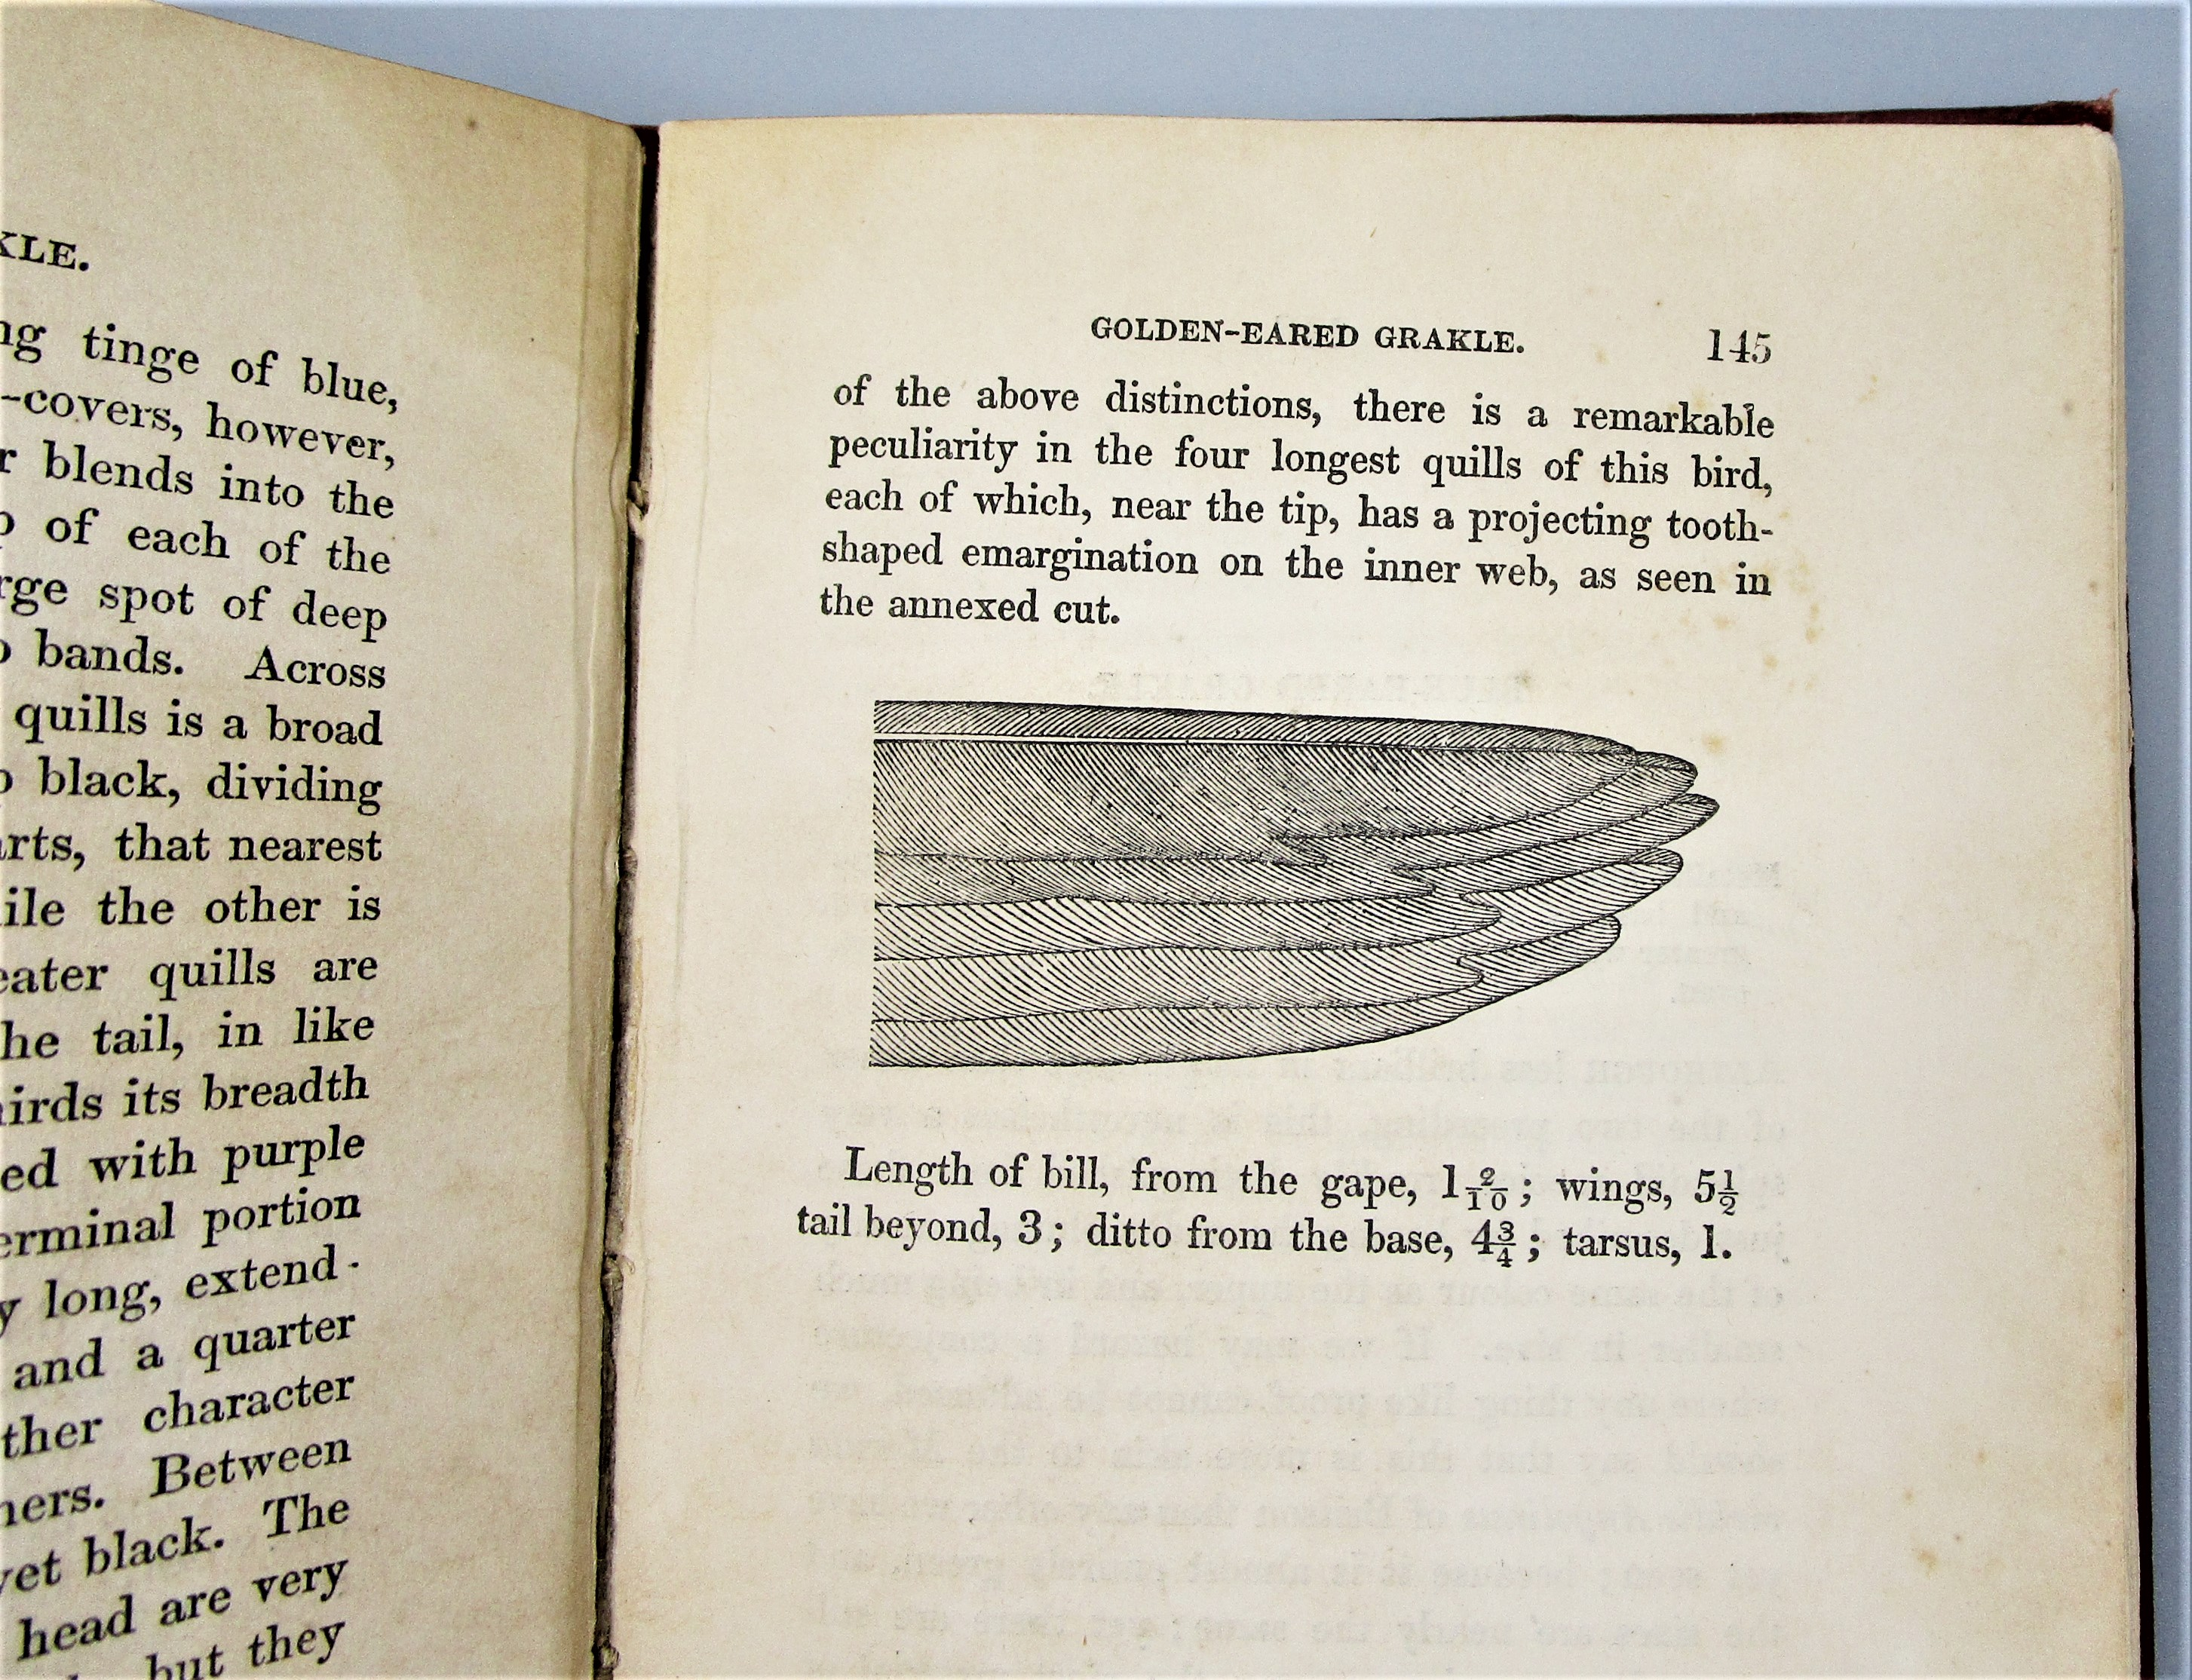 ORNITHOLOGY, BIRDS OF WESTERN AFRICA, Part I, by  Wm Jardine - 1862 [Vol XI]